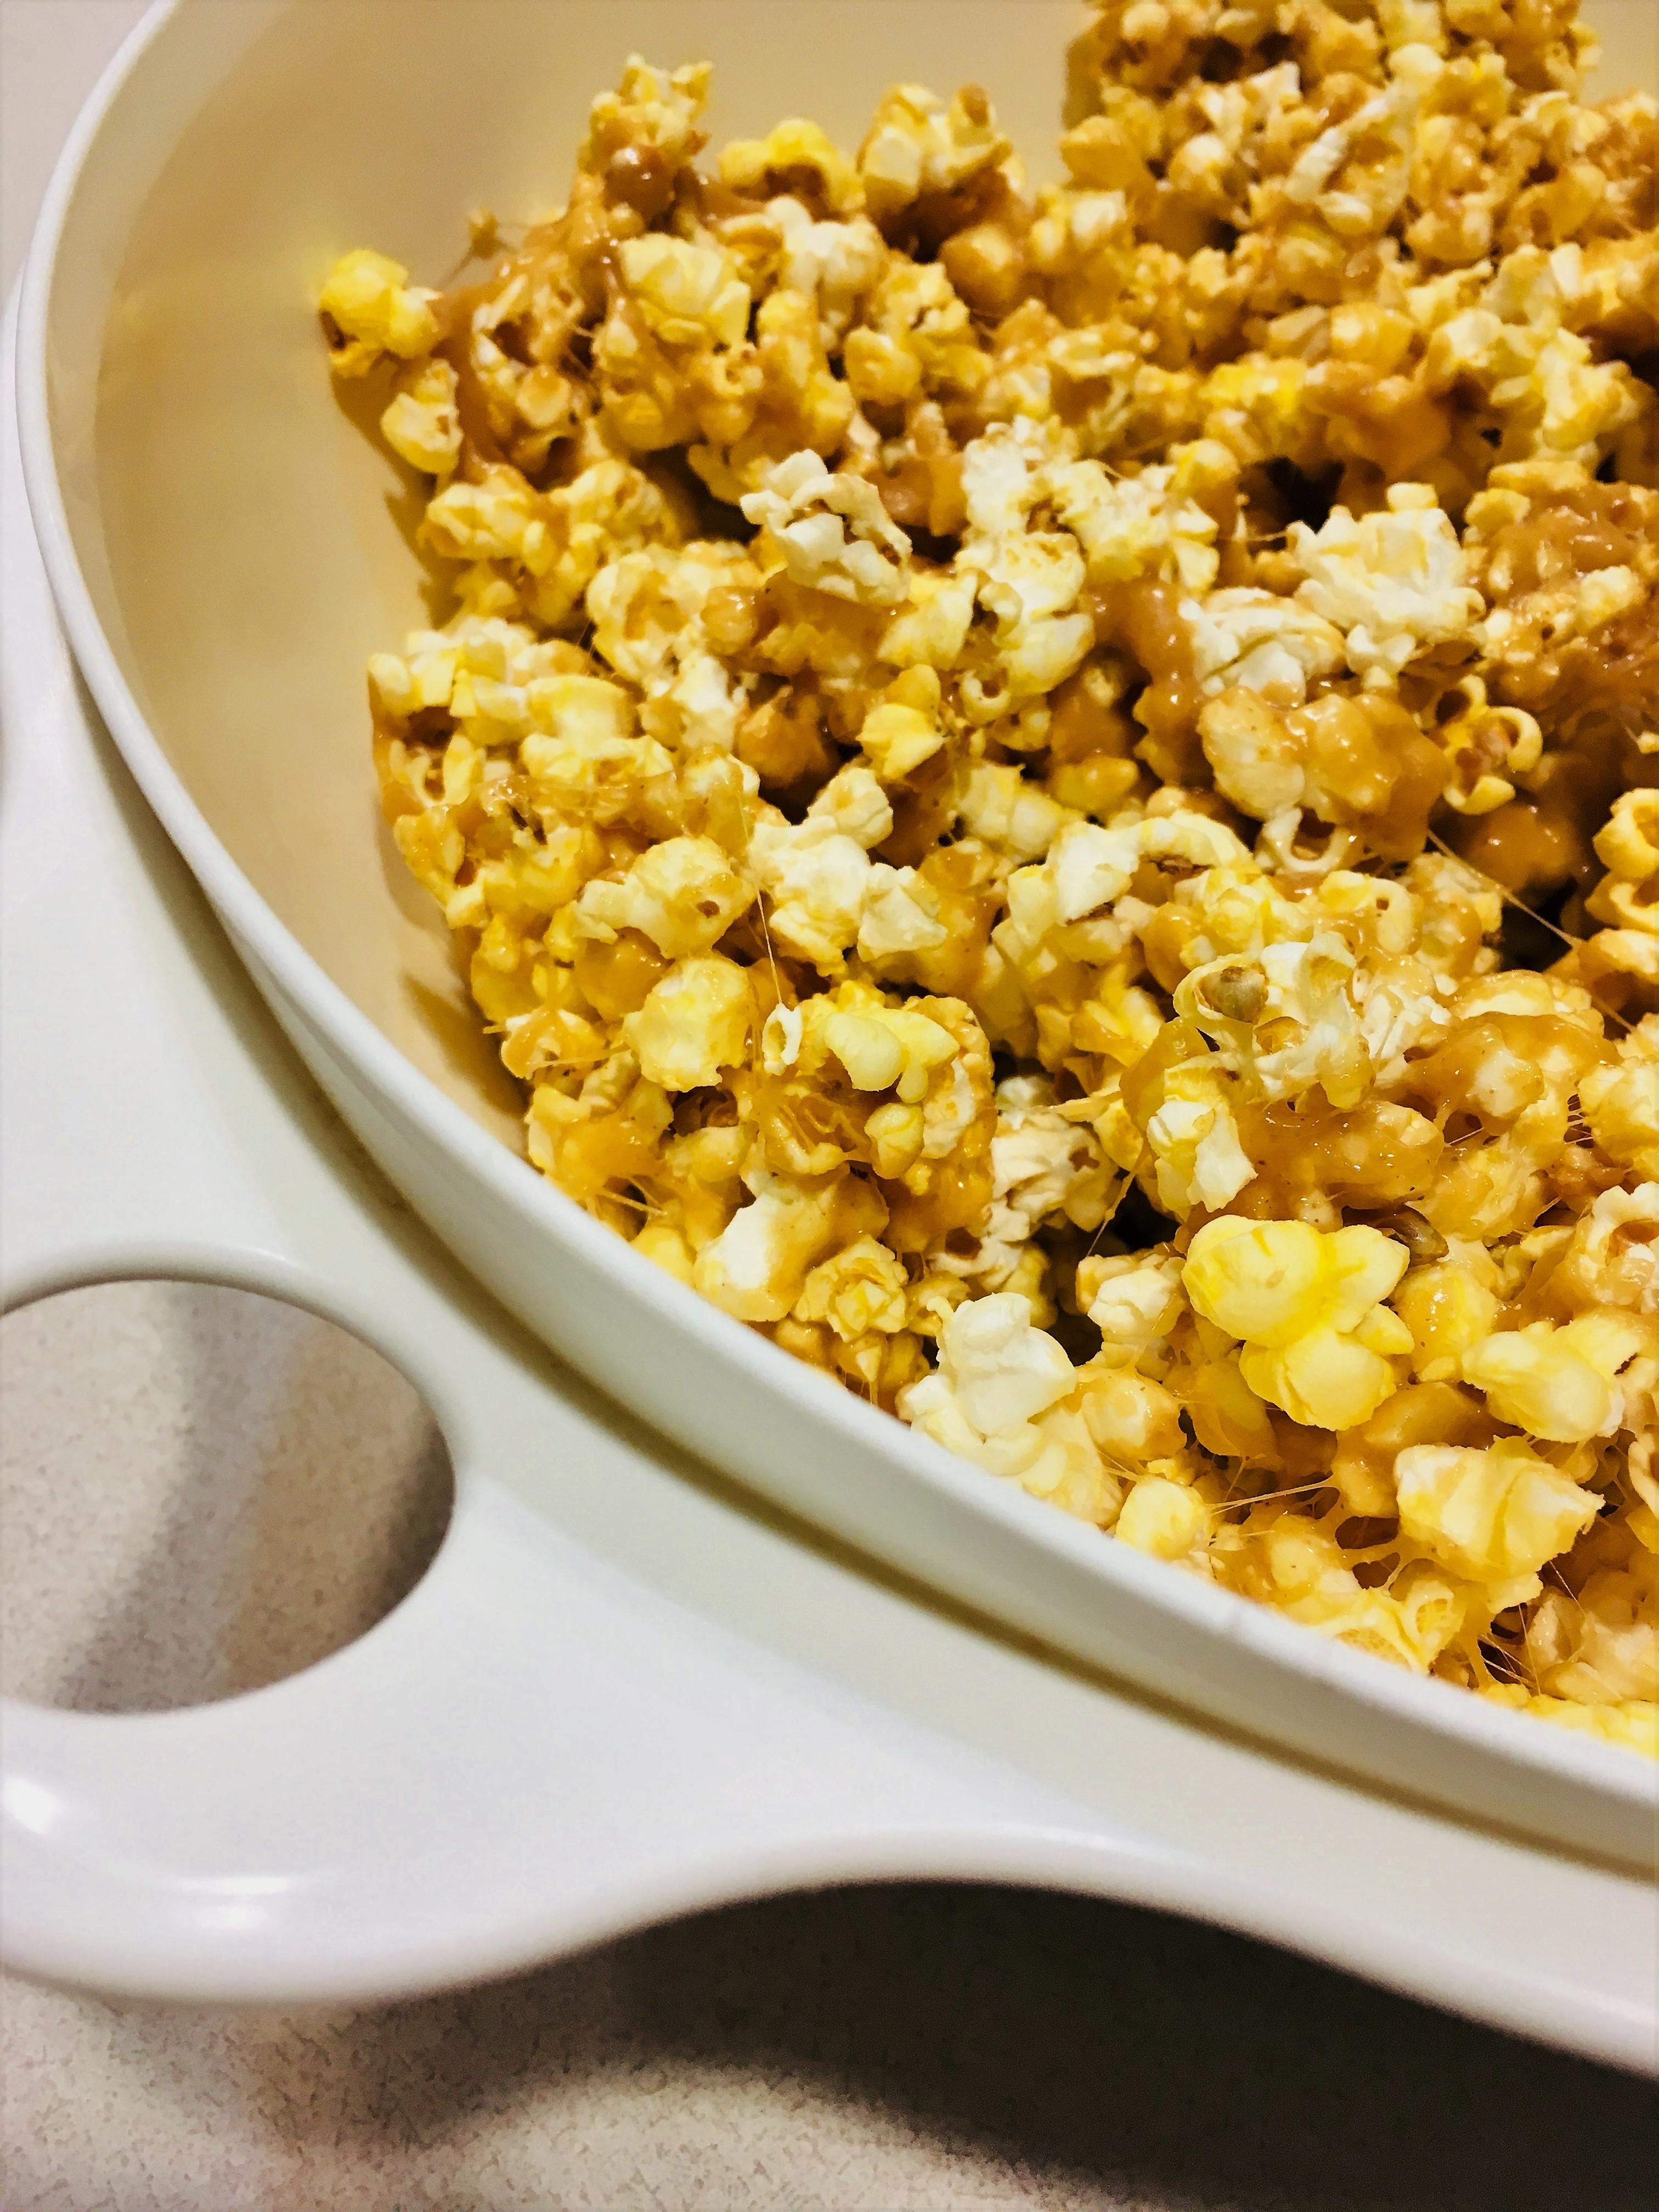 Peanut Butter Popcorn HurdBird